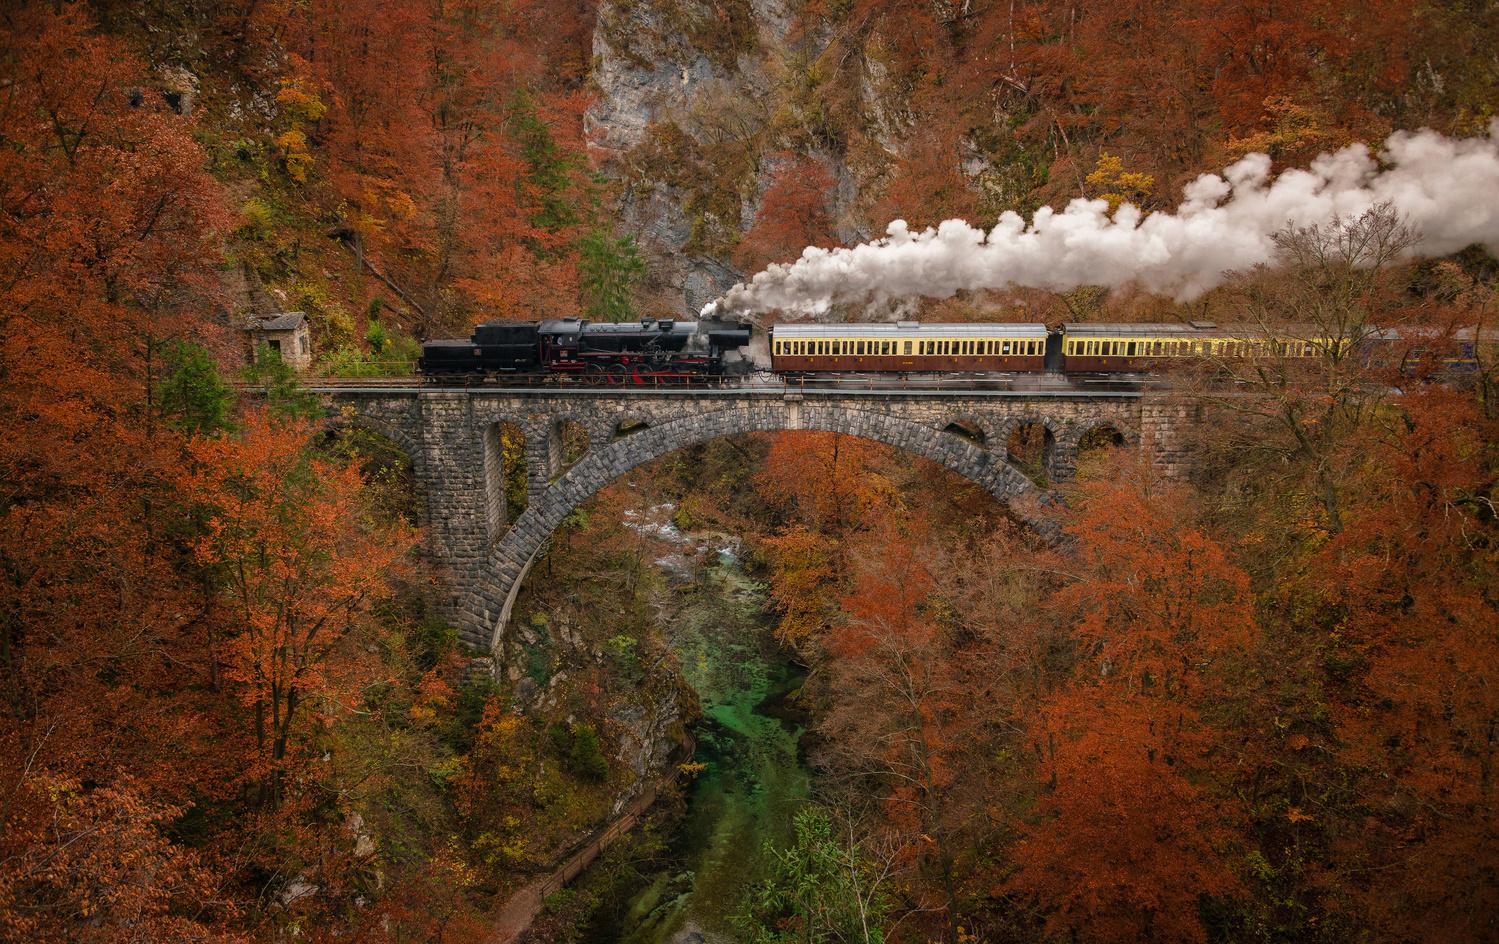 Steam train by Ales Krivec